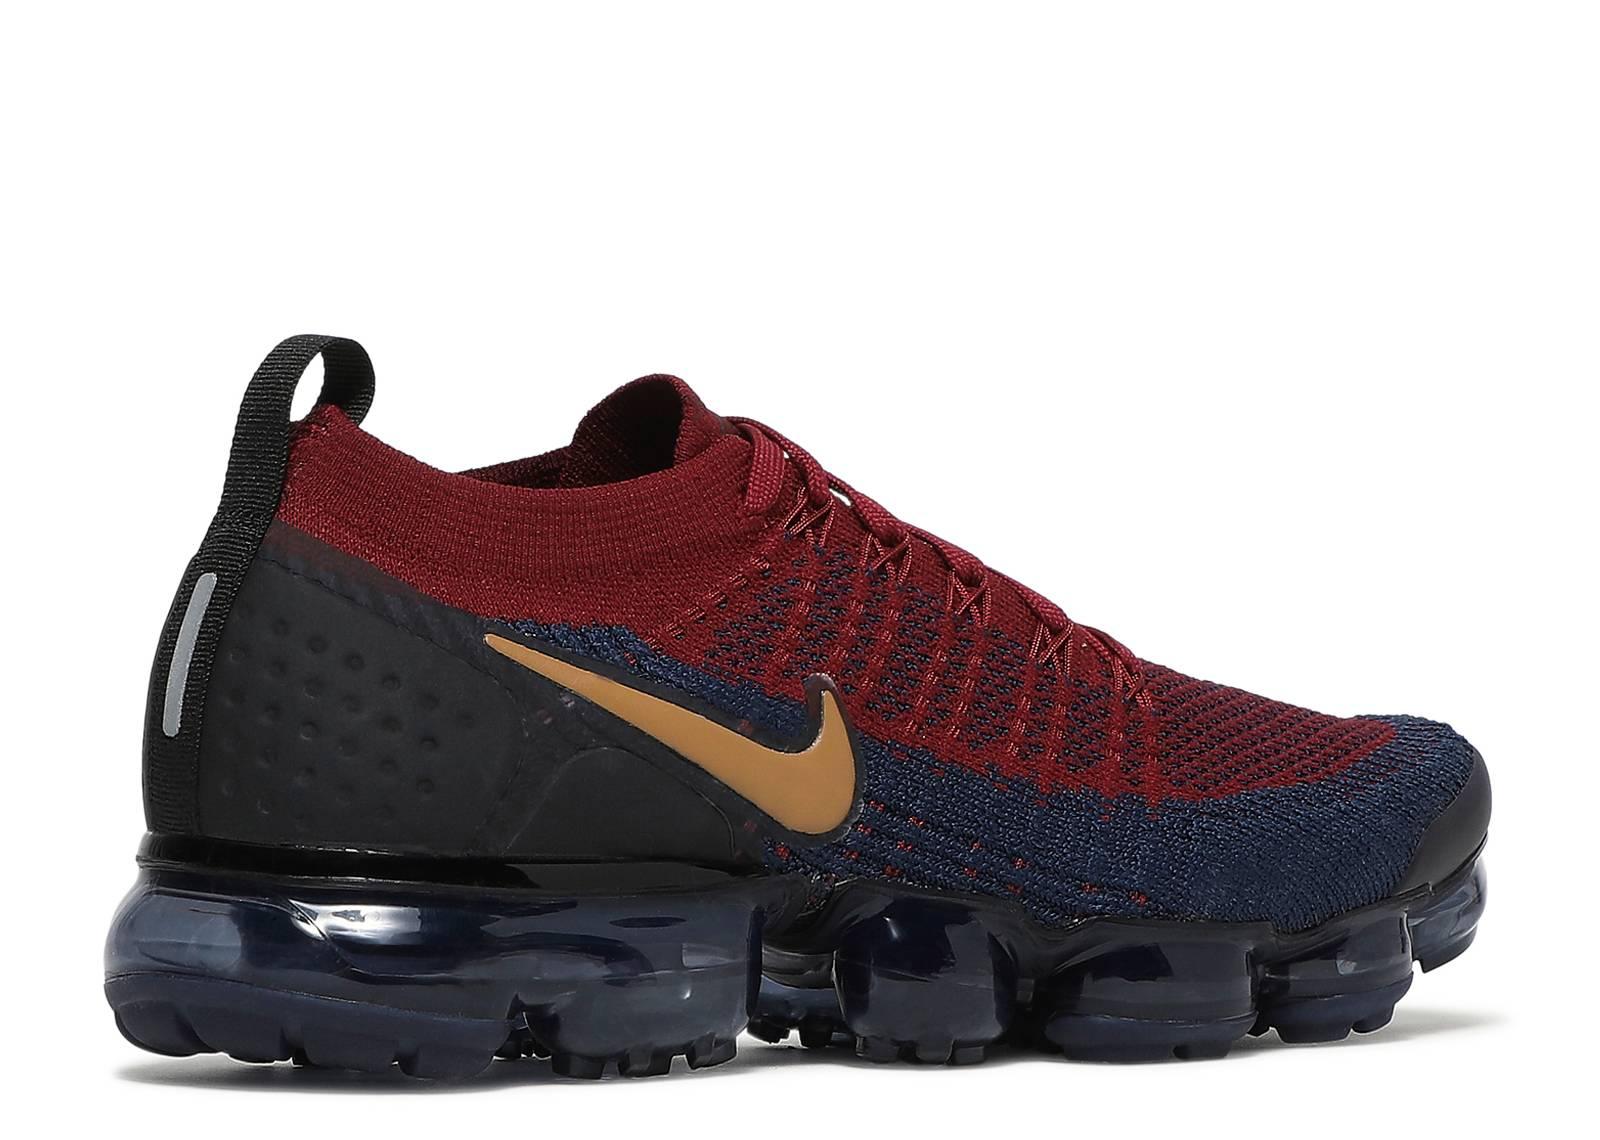 d1713f3158fb4 Nike Air Vapormax Flyknit 2 - Nike - 942842 604 - team red wheat-obsidian-black